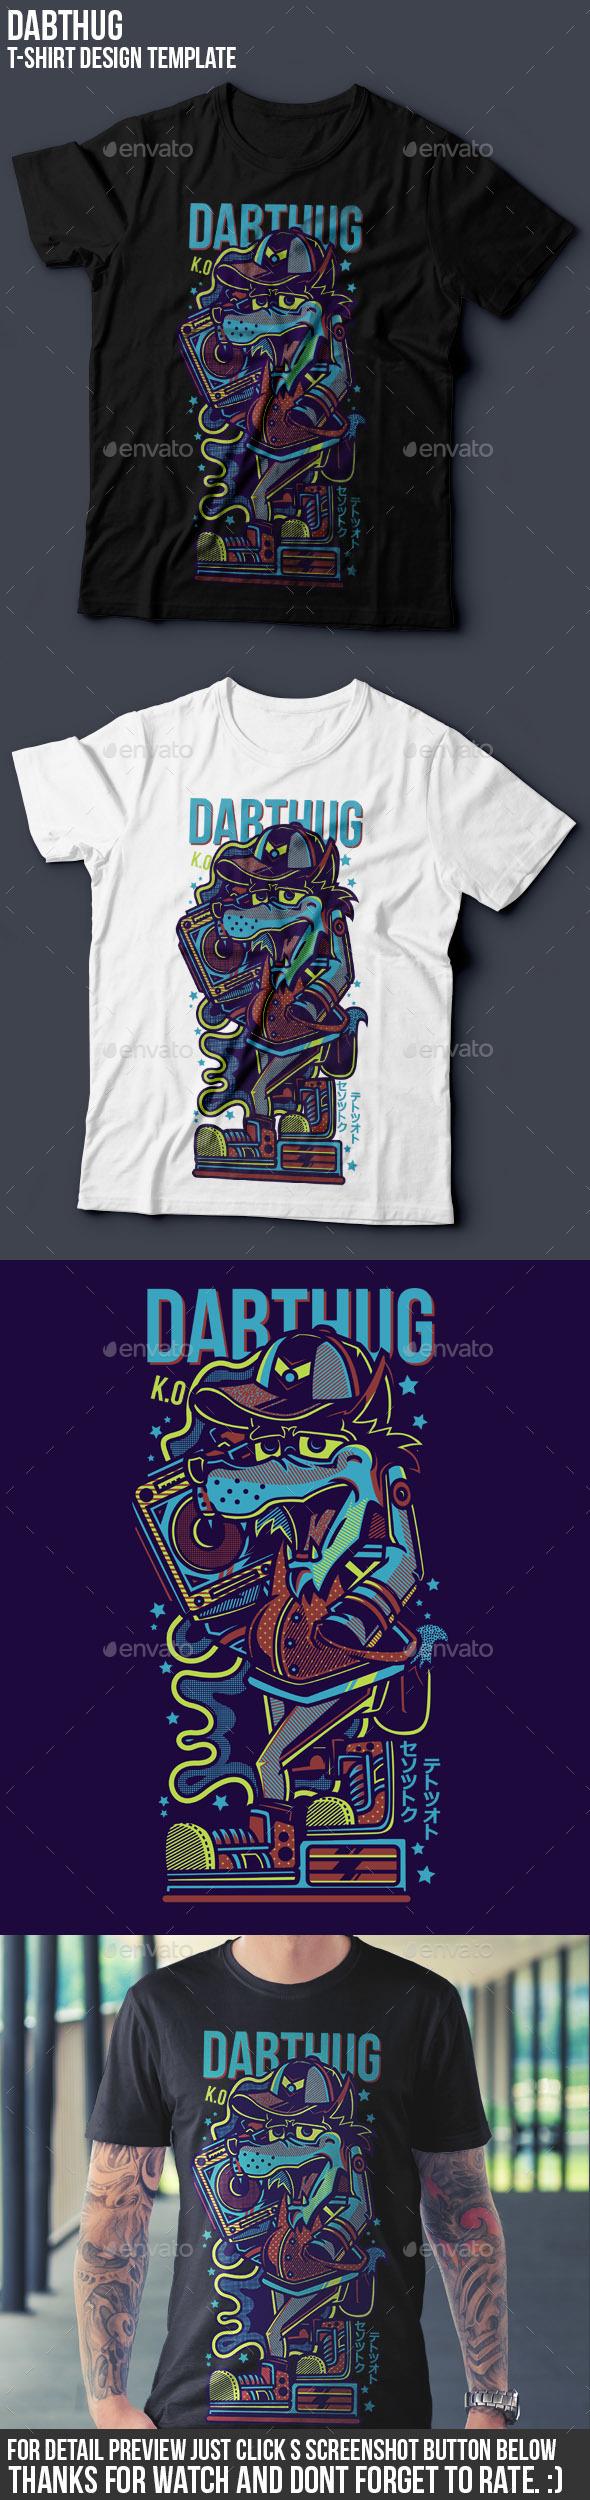 Dabthug T-Shirt Design - Events T-Shirts